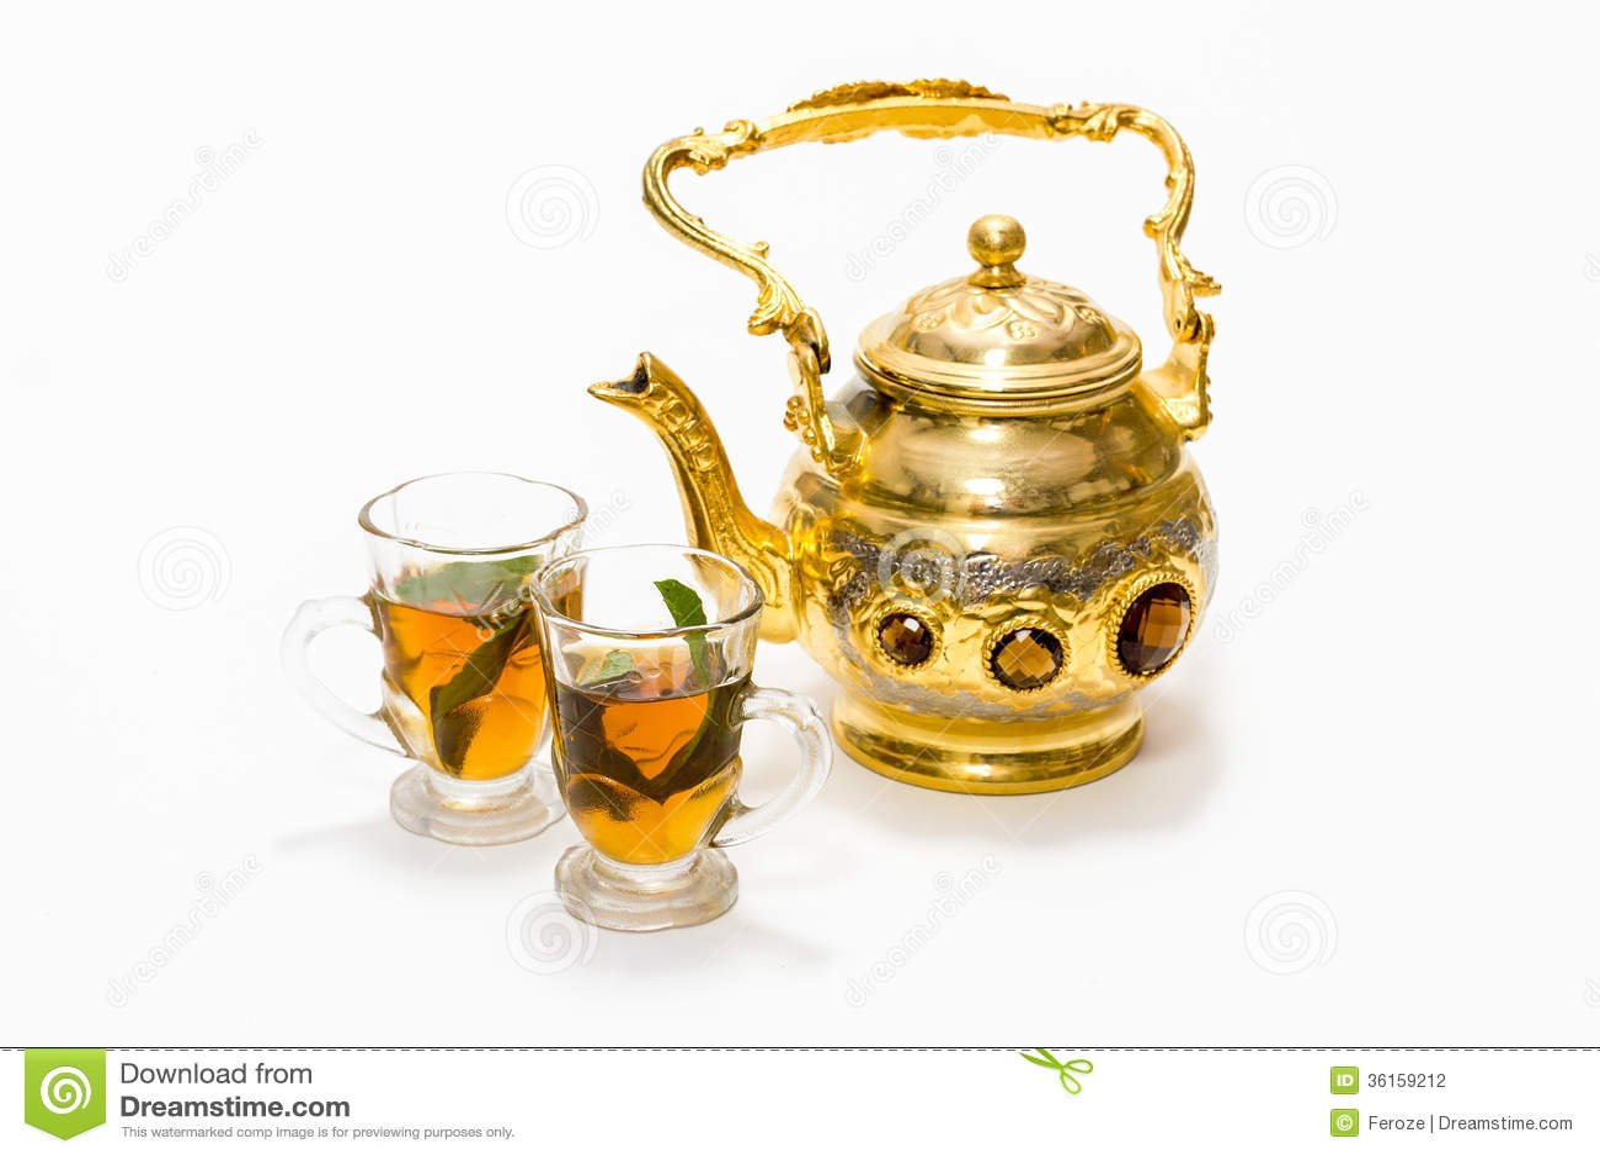 Arabic Coffee Pot And Glasses Stock Photo Image 36159212